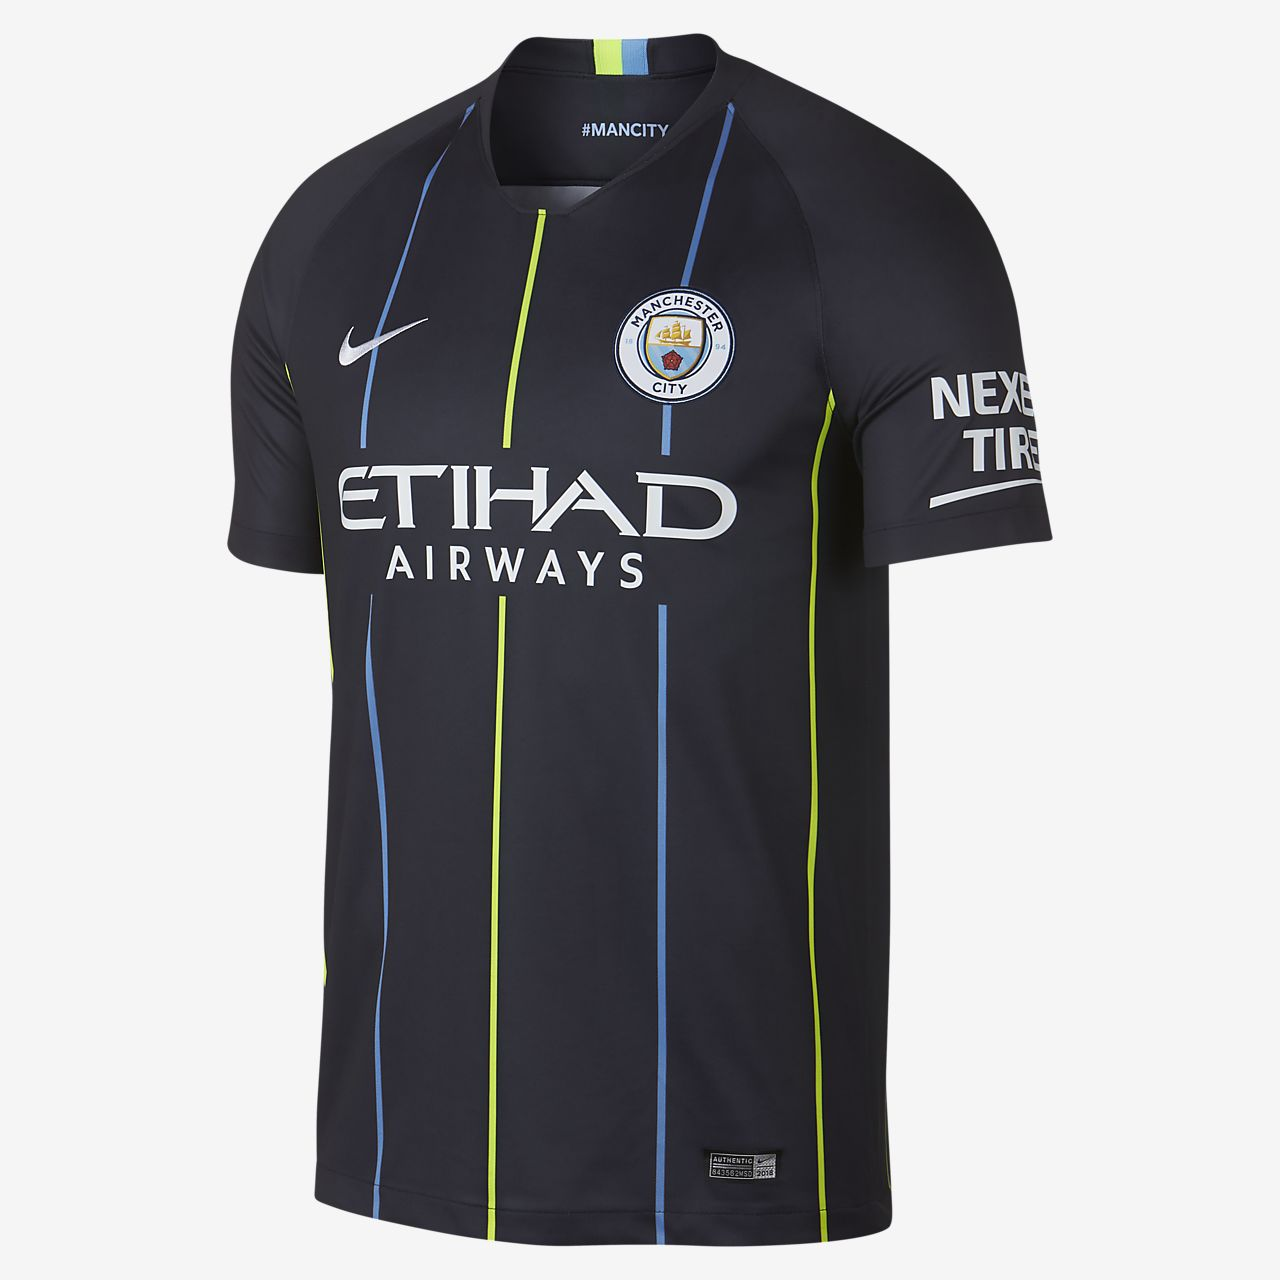 Camiseta de fútbol para hombre de visitante Stadium del Manchester City FC 2018/19